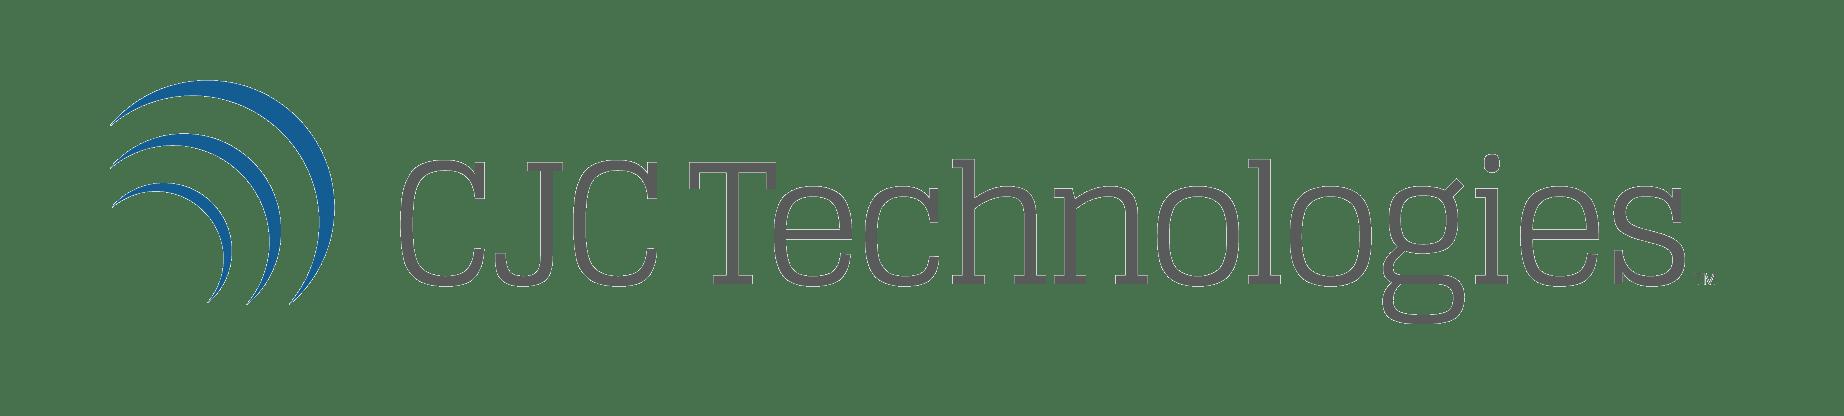 CJC Technologies (larger).png